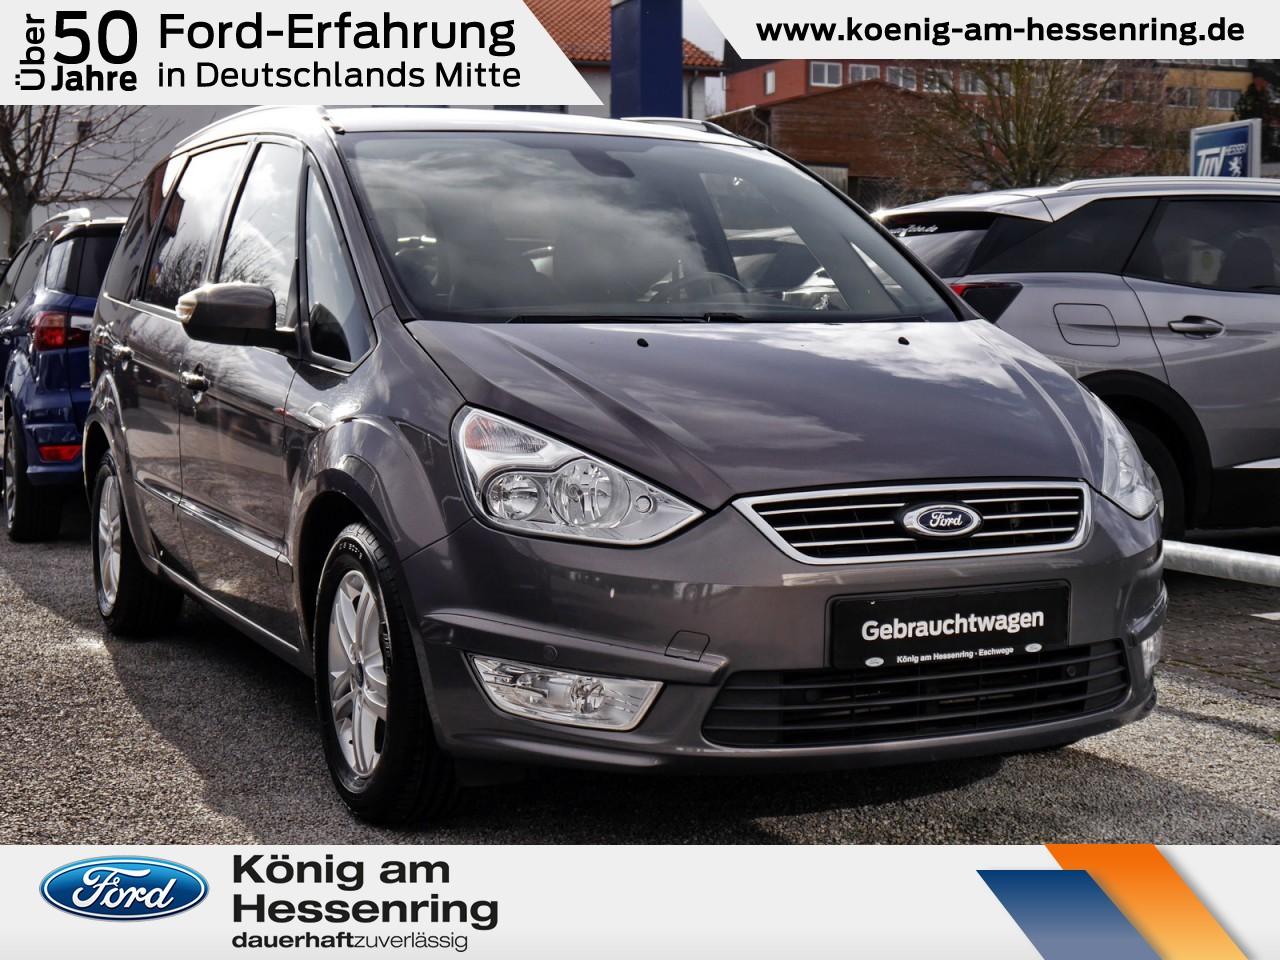 Ford Galaxy Champion 2.0 TDCi NAV+AHK+Tempomat+Sitzhz, Jahr 2012, Diesel